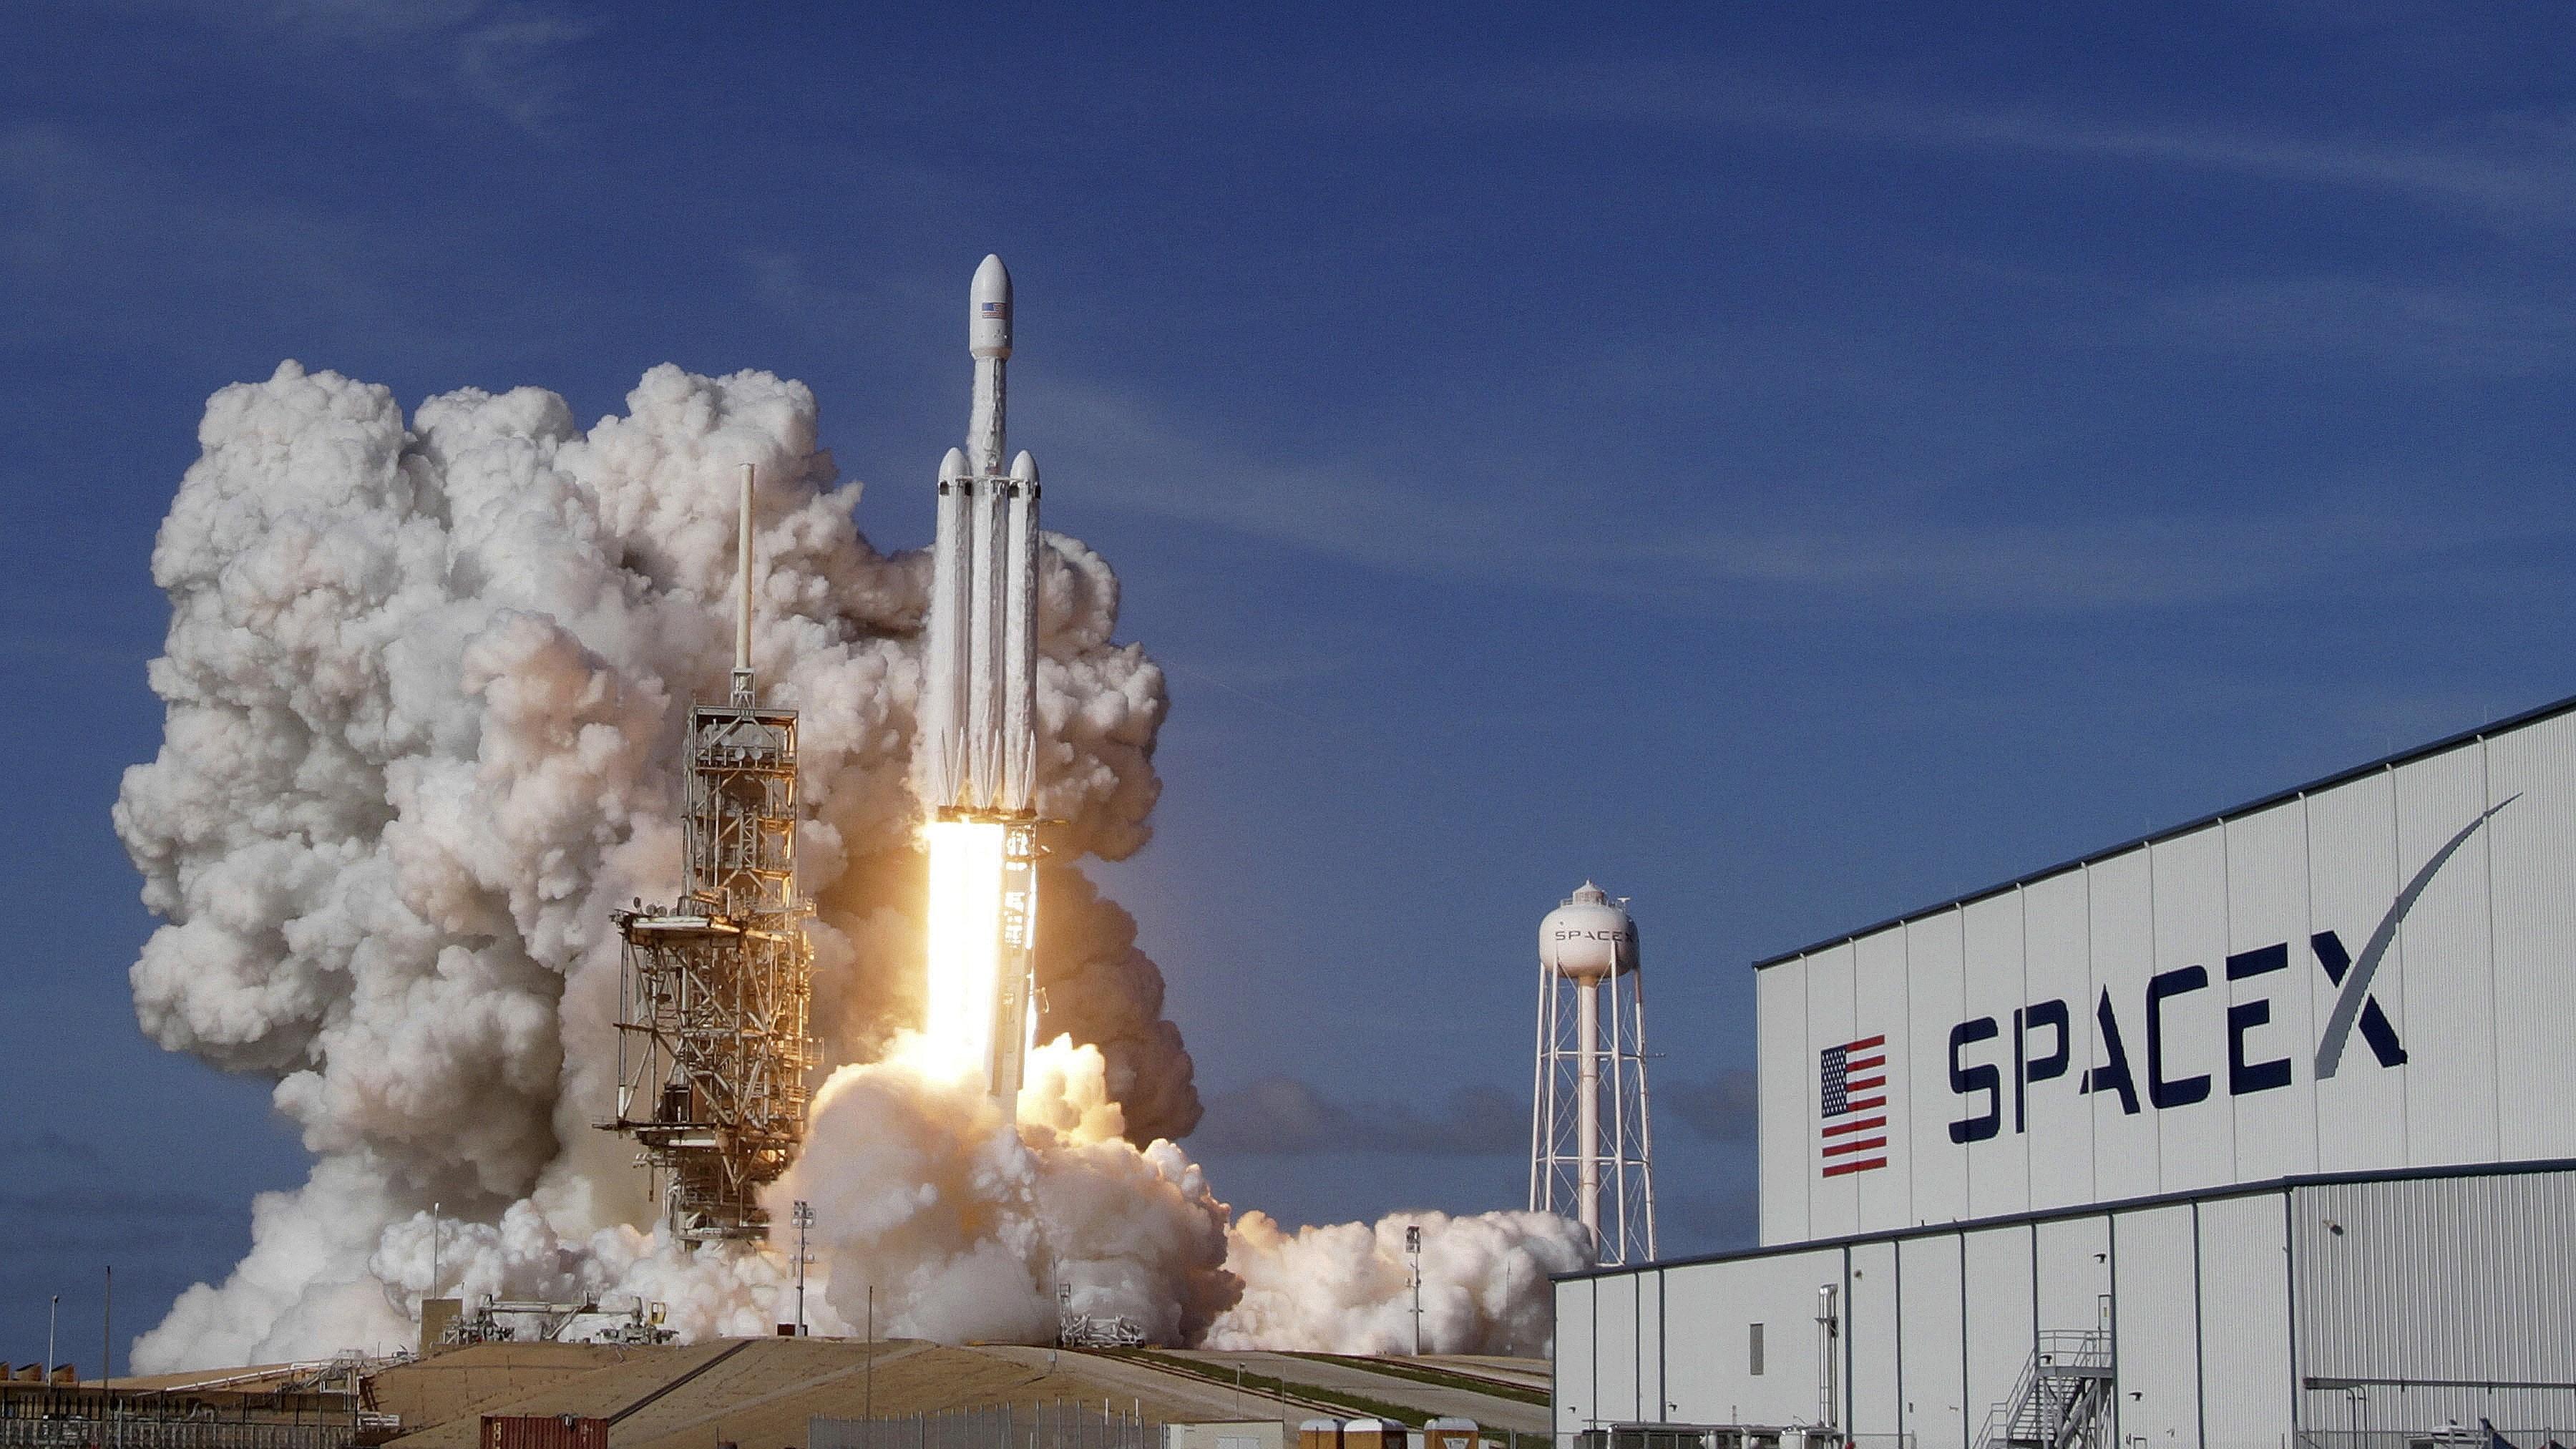 SpaceX покажет прямую трансляцию запуска ракеты Falcon 9